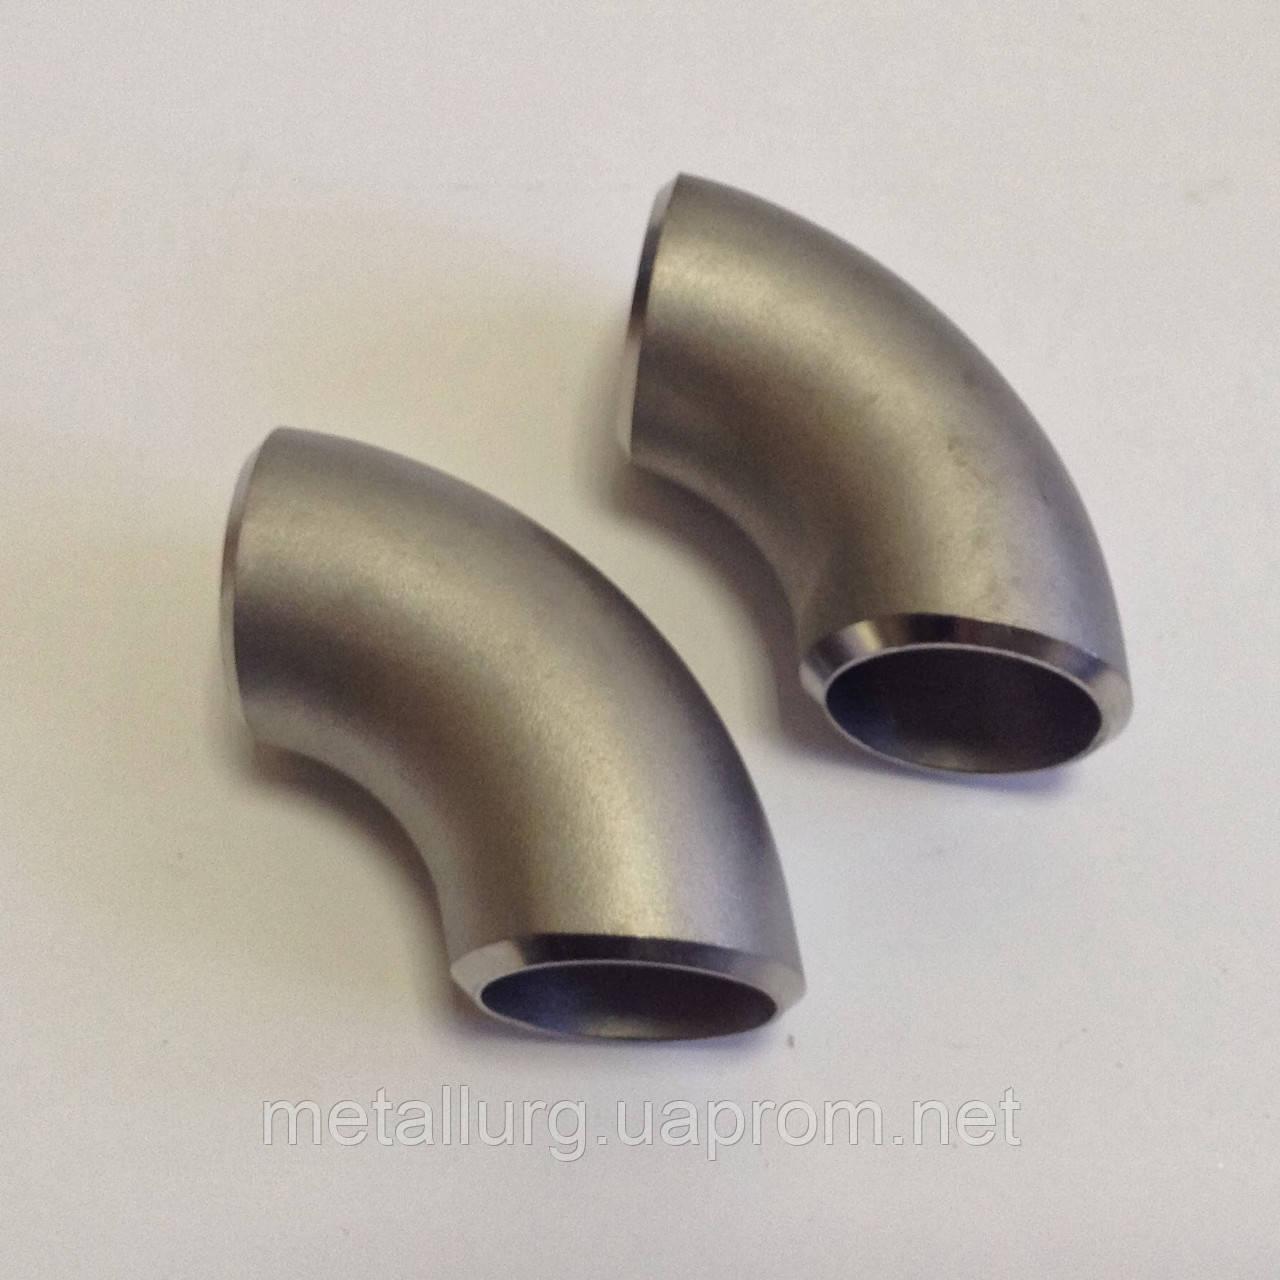 Отвод крутоизогнутый 90 гр DIN EN 10204-2005